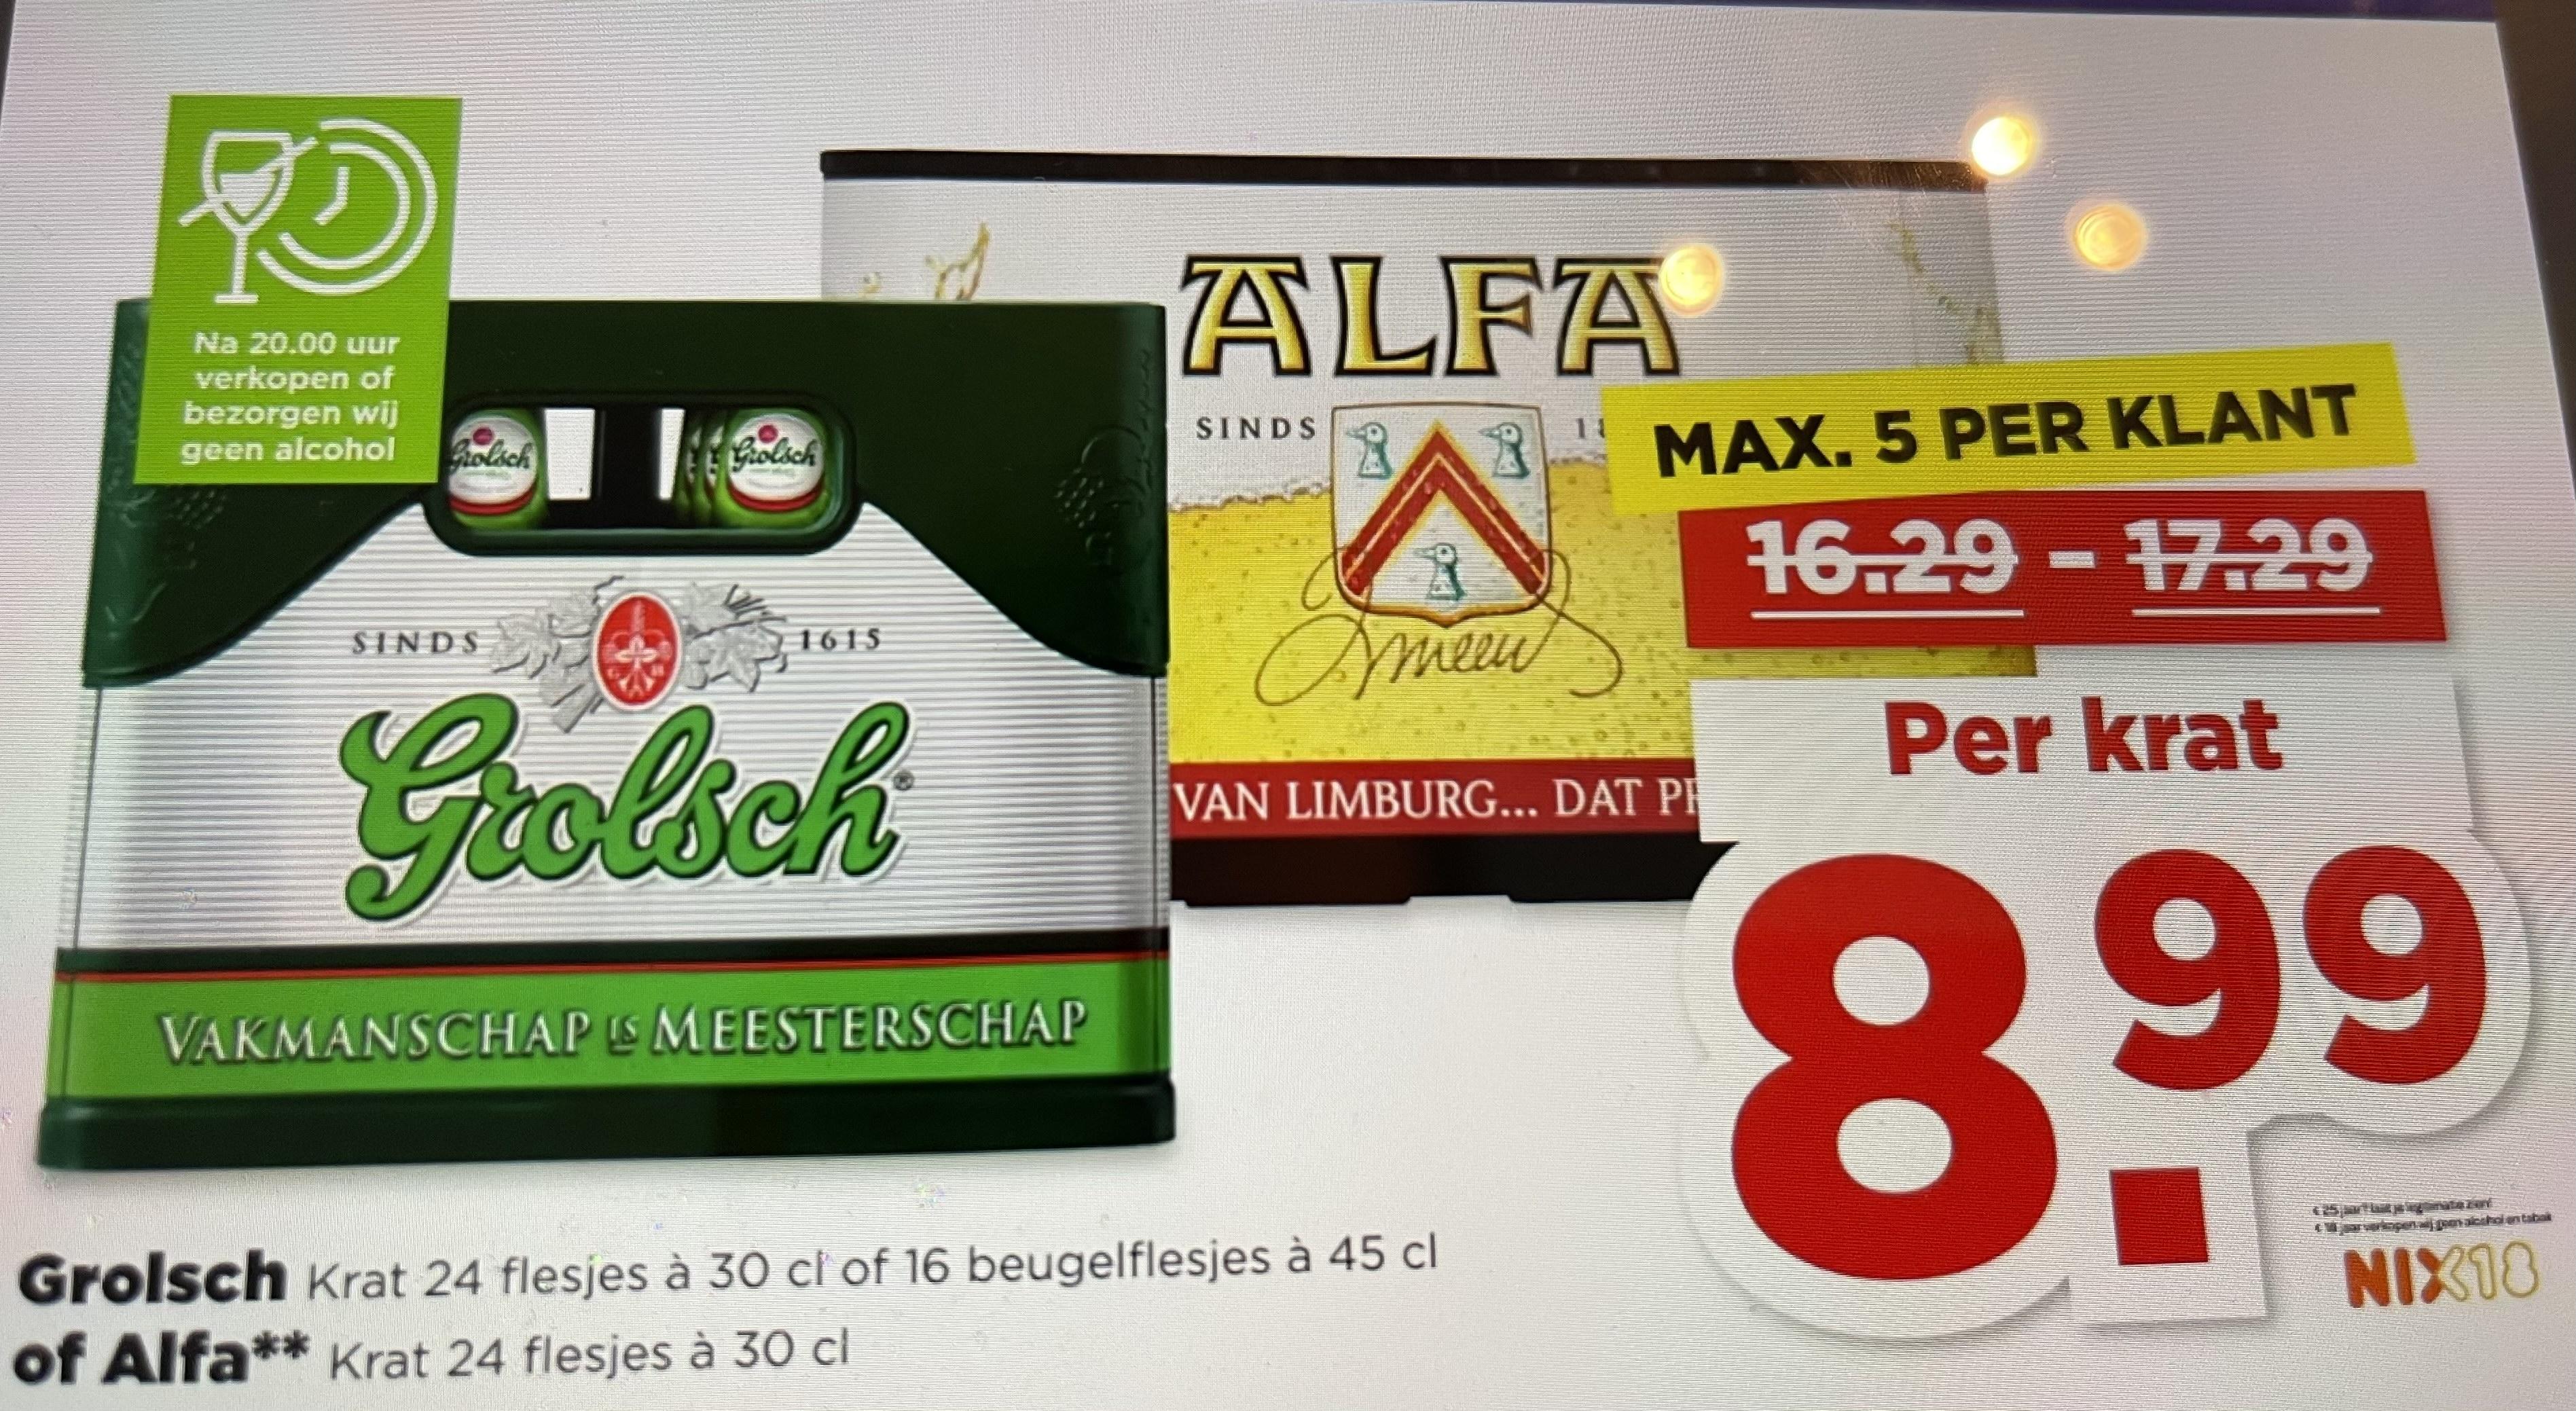 Alfa pils krat 24 flesjes